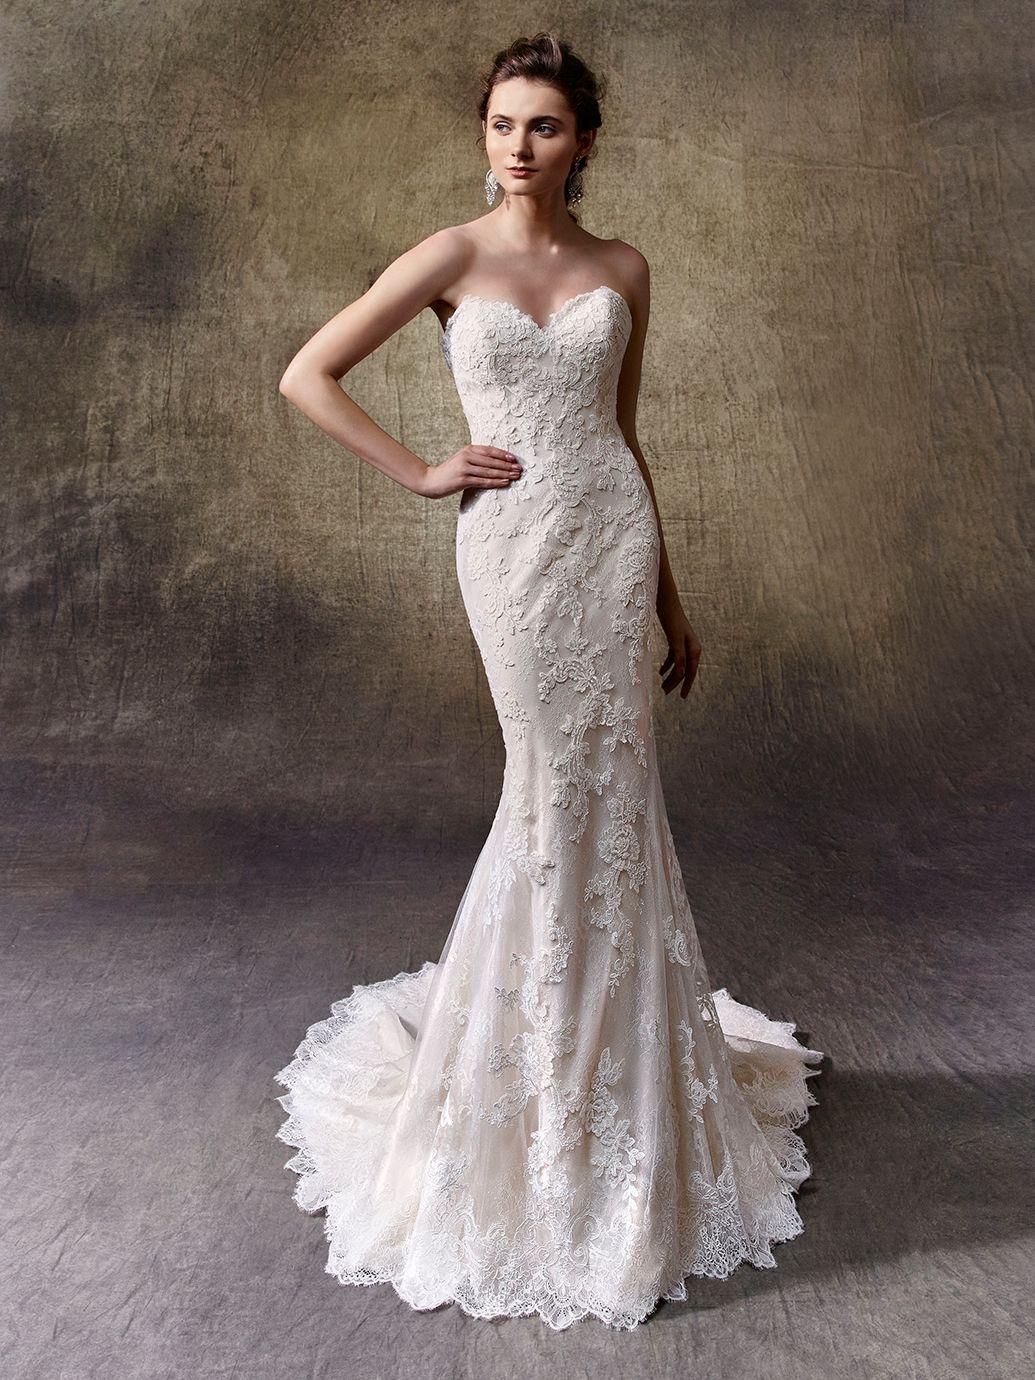 enzoani lucie front view beauty pinterest wedding dress